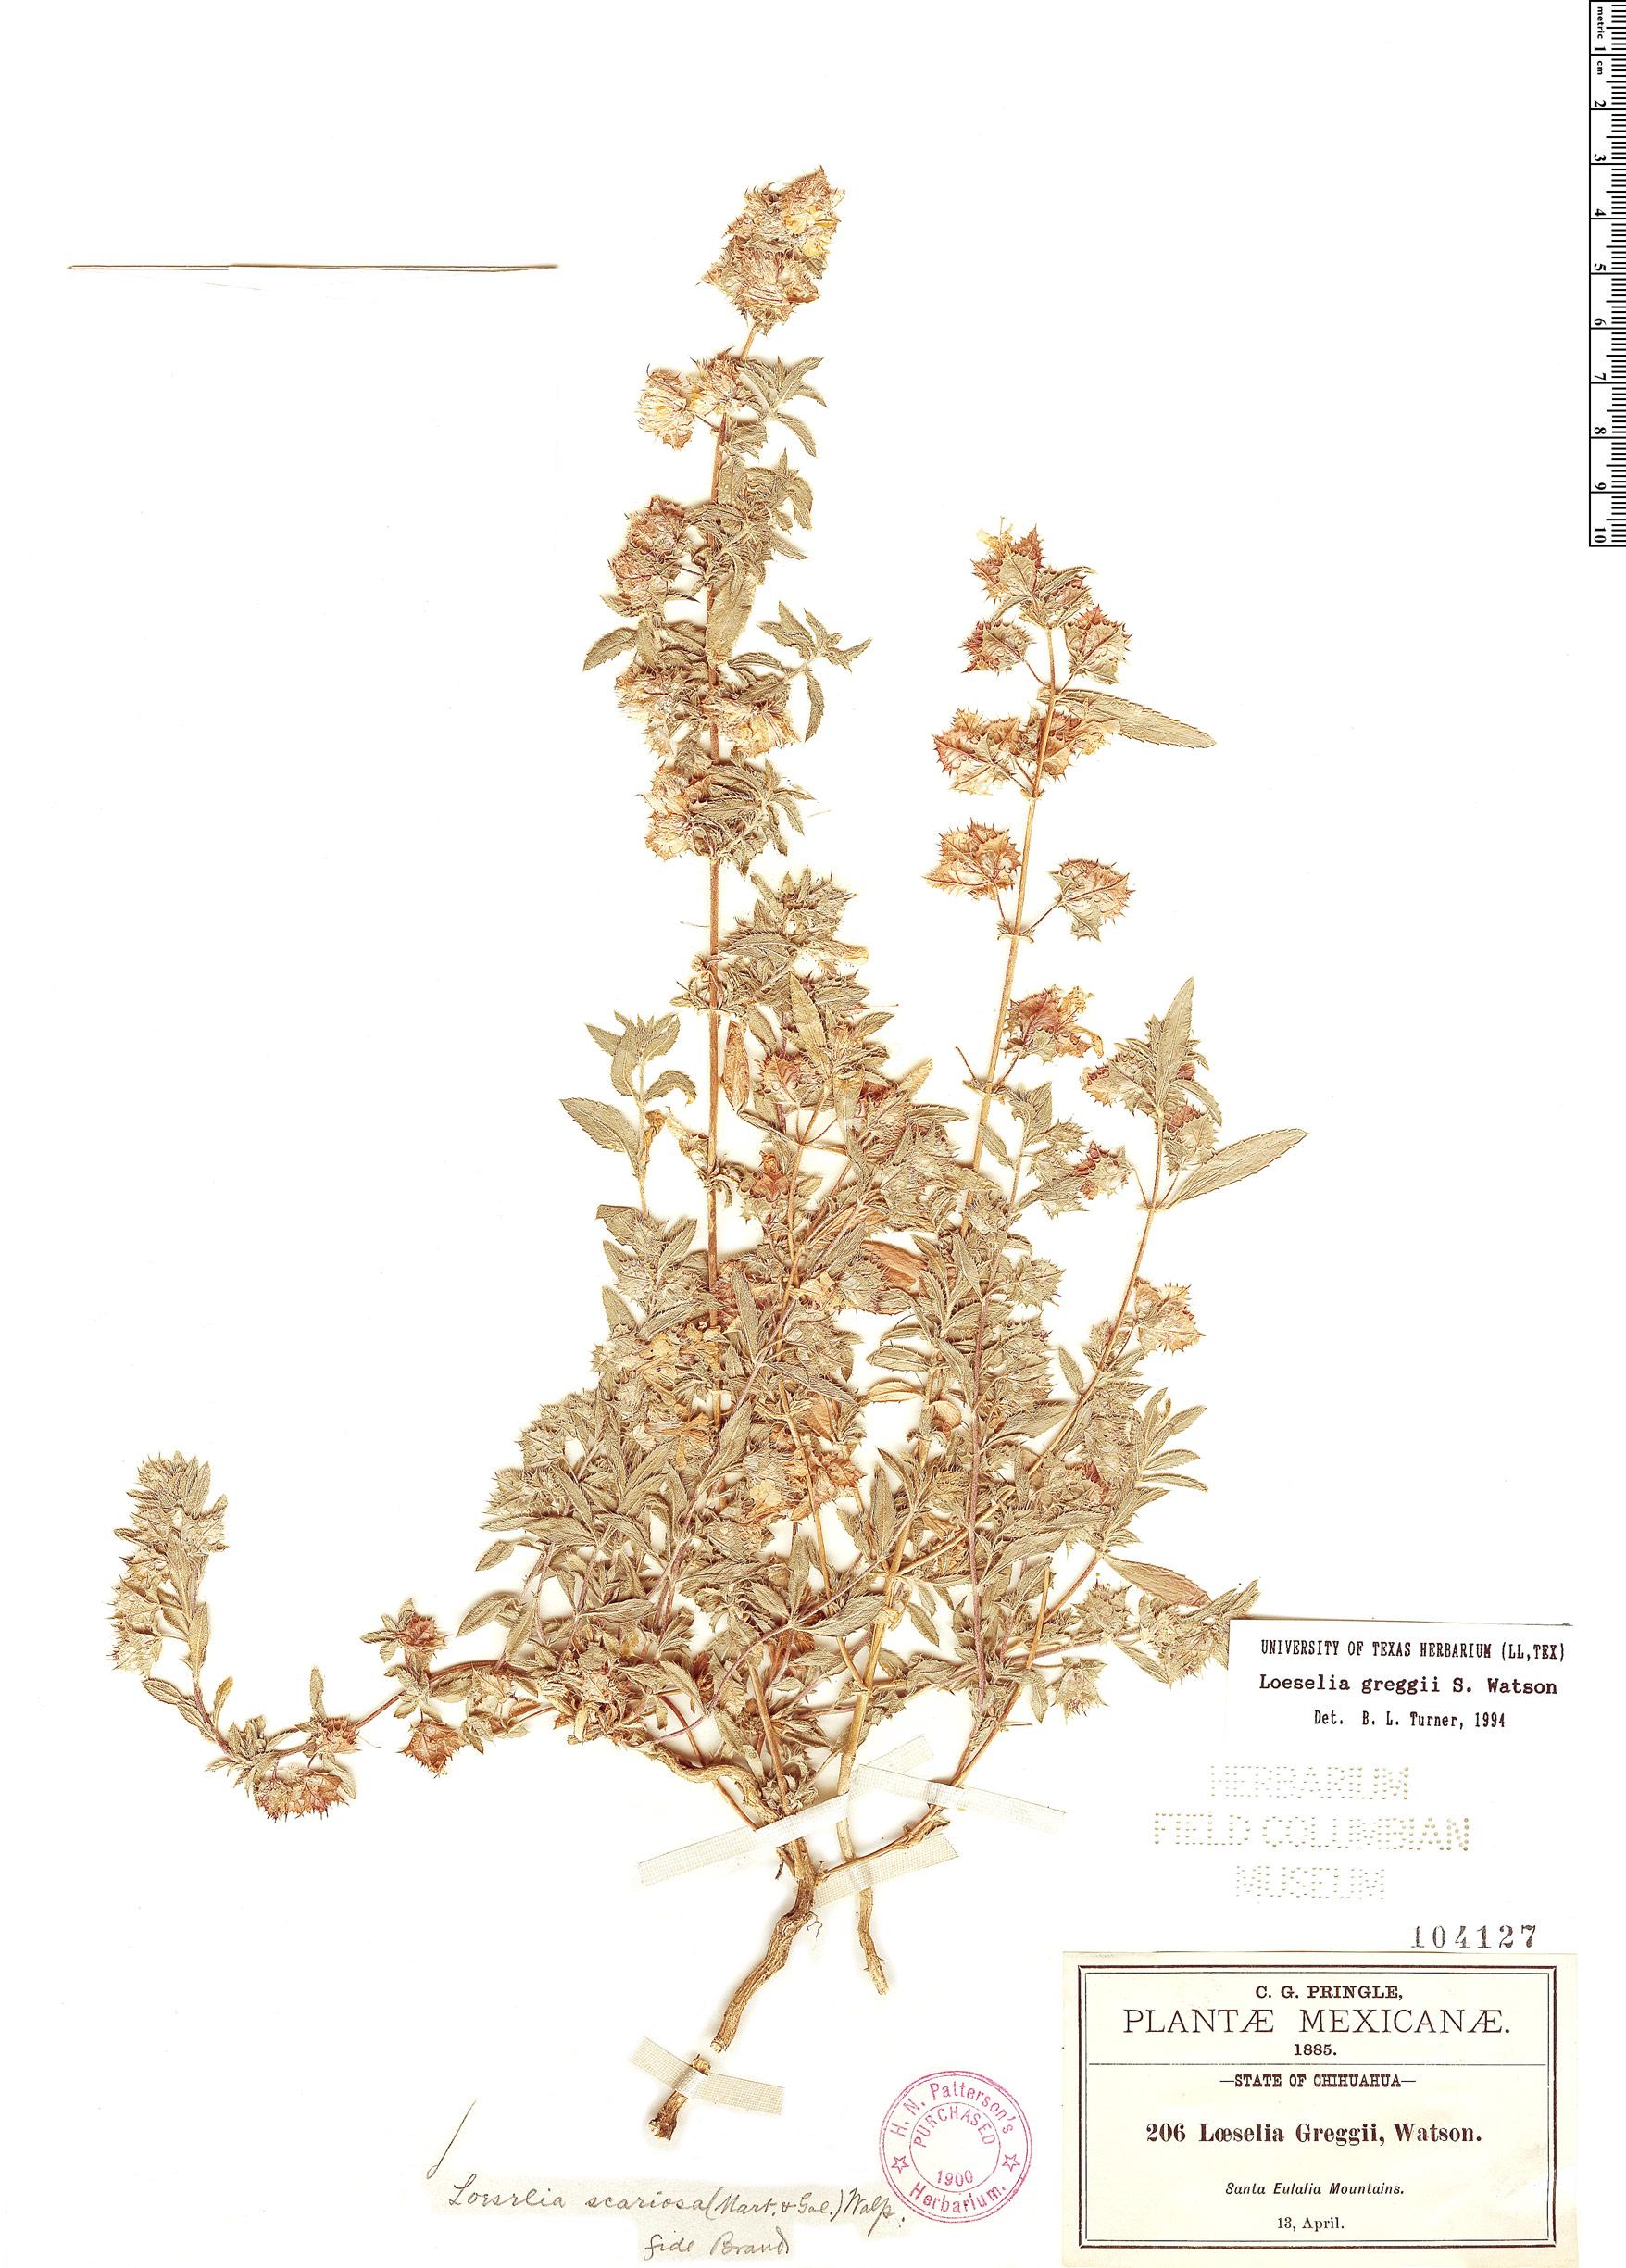 Specimen: Loeselia greggii